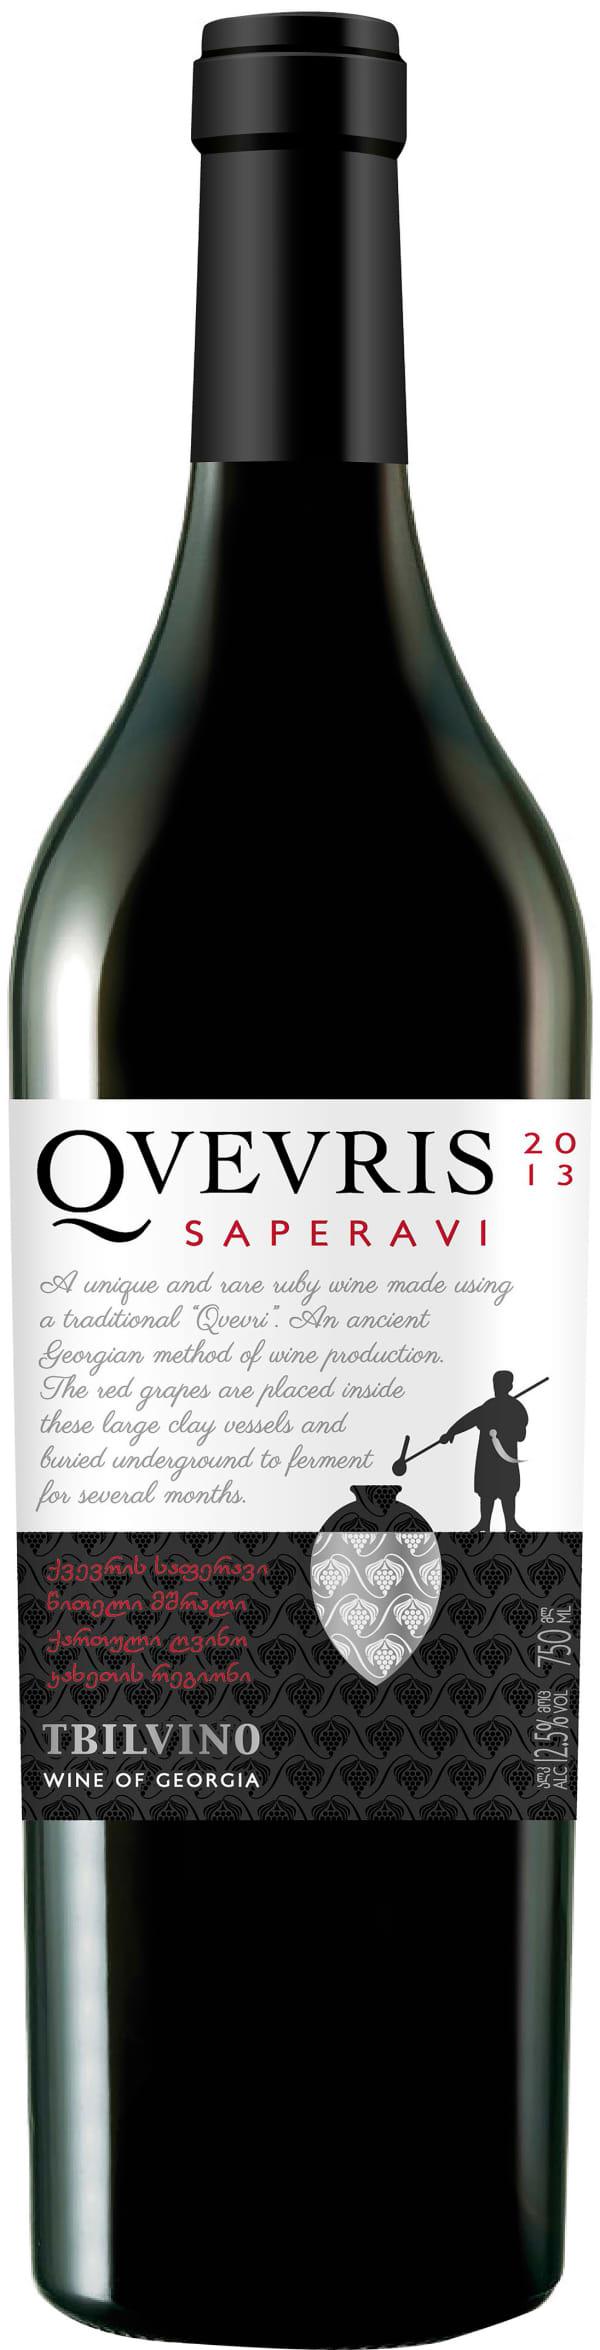 Qvevris Saperavi 2019